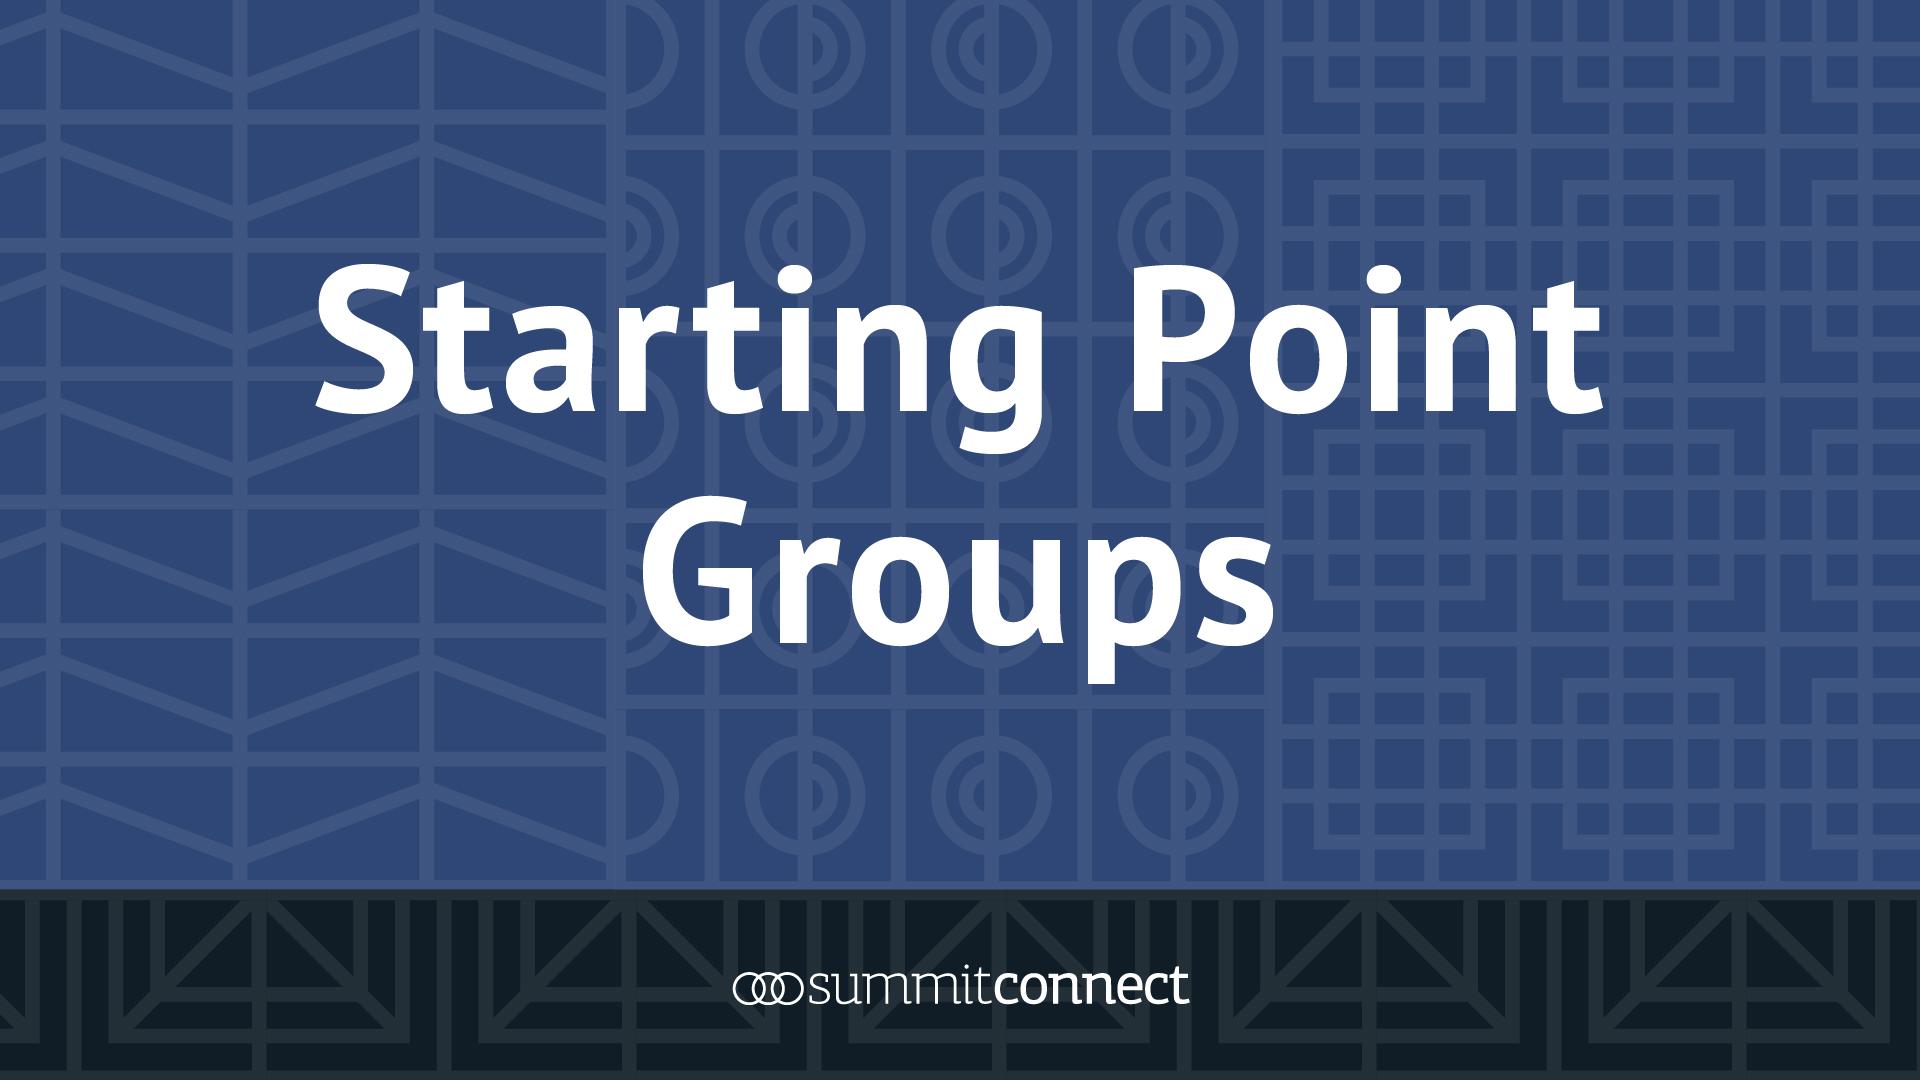 StartingPointGroups_web.jpg